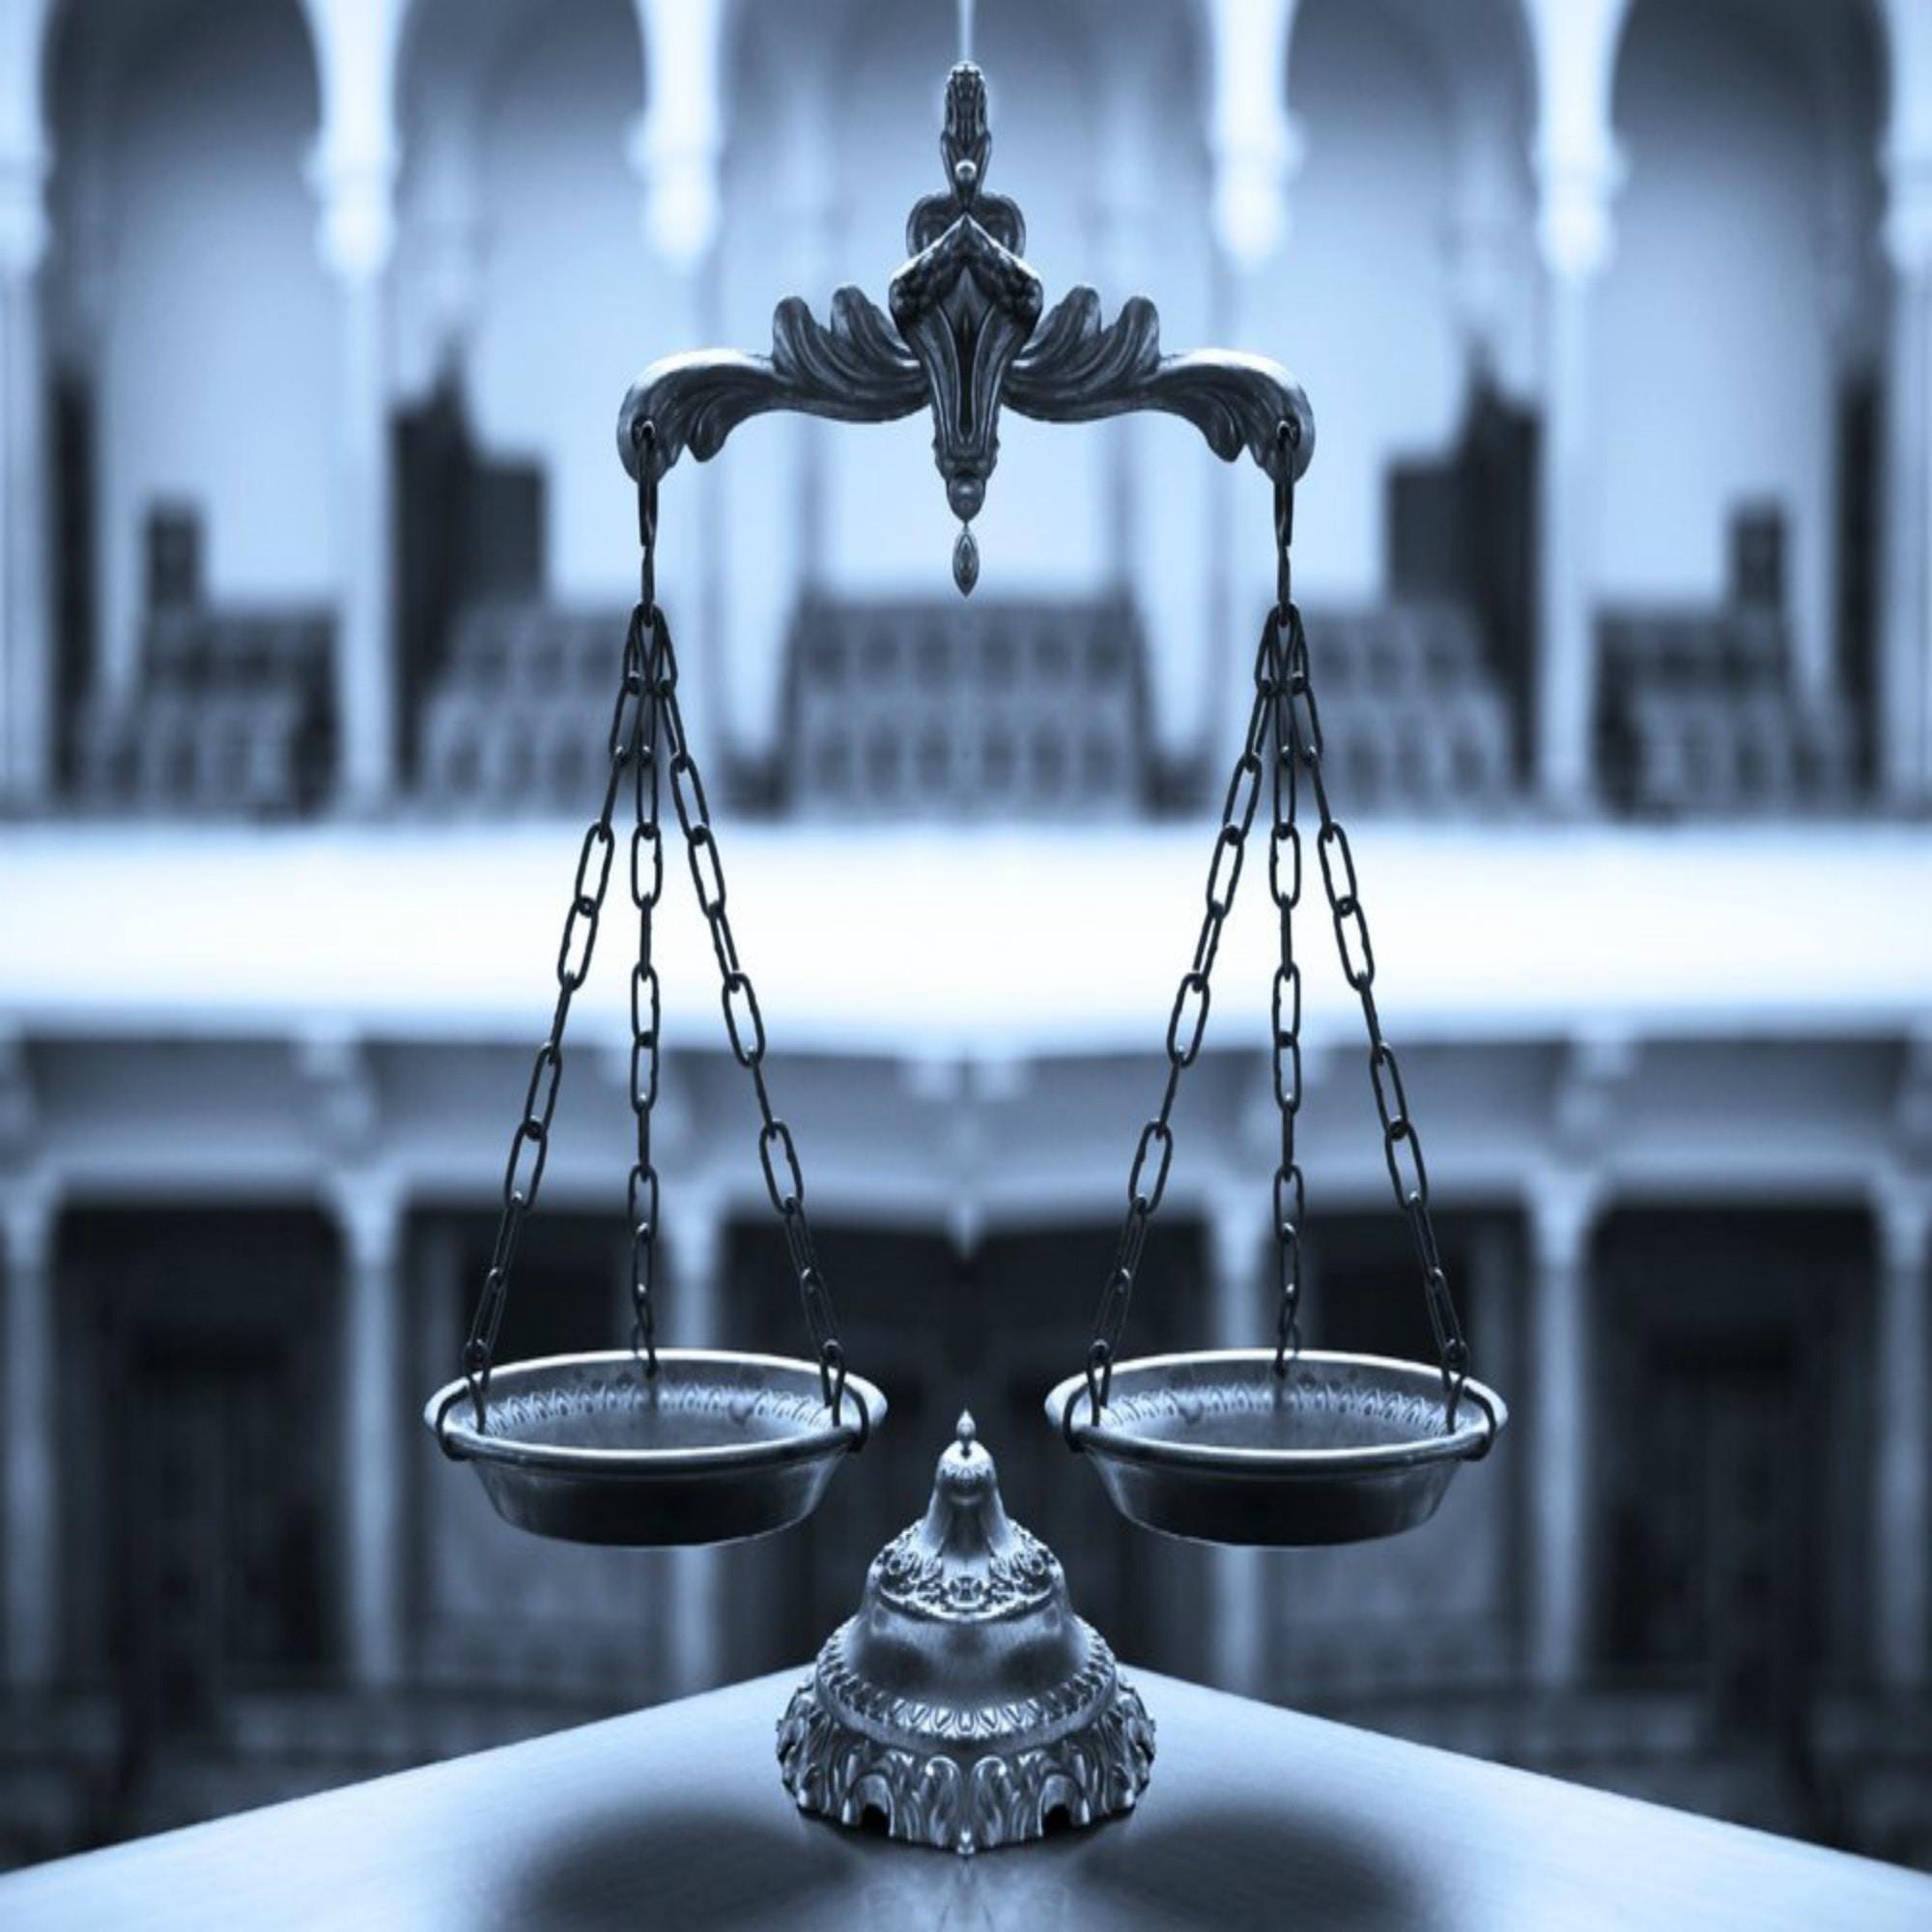 Eminent-domain-lawyer-appeals-minneapolis.jpg